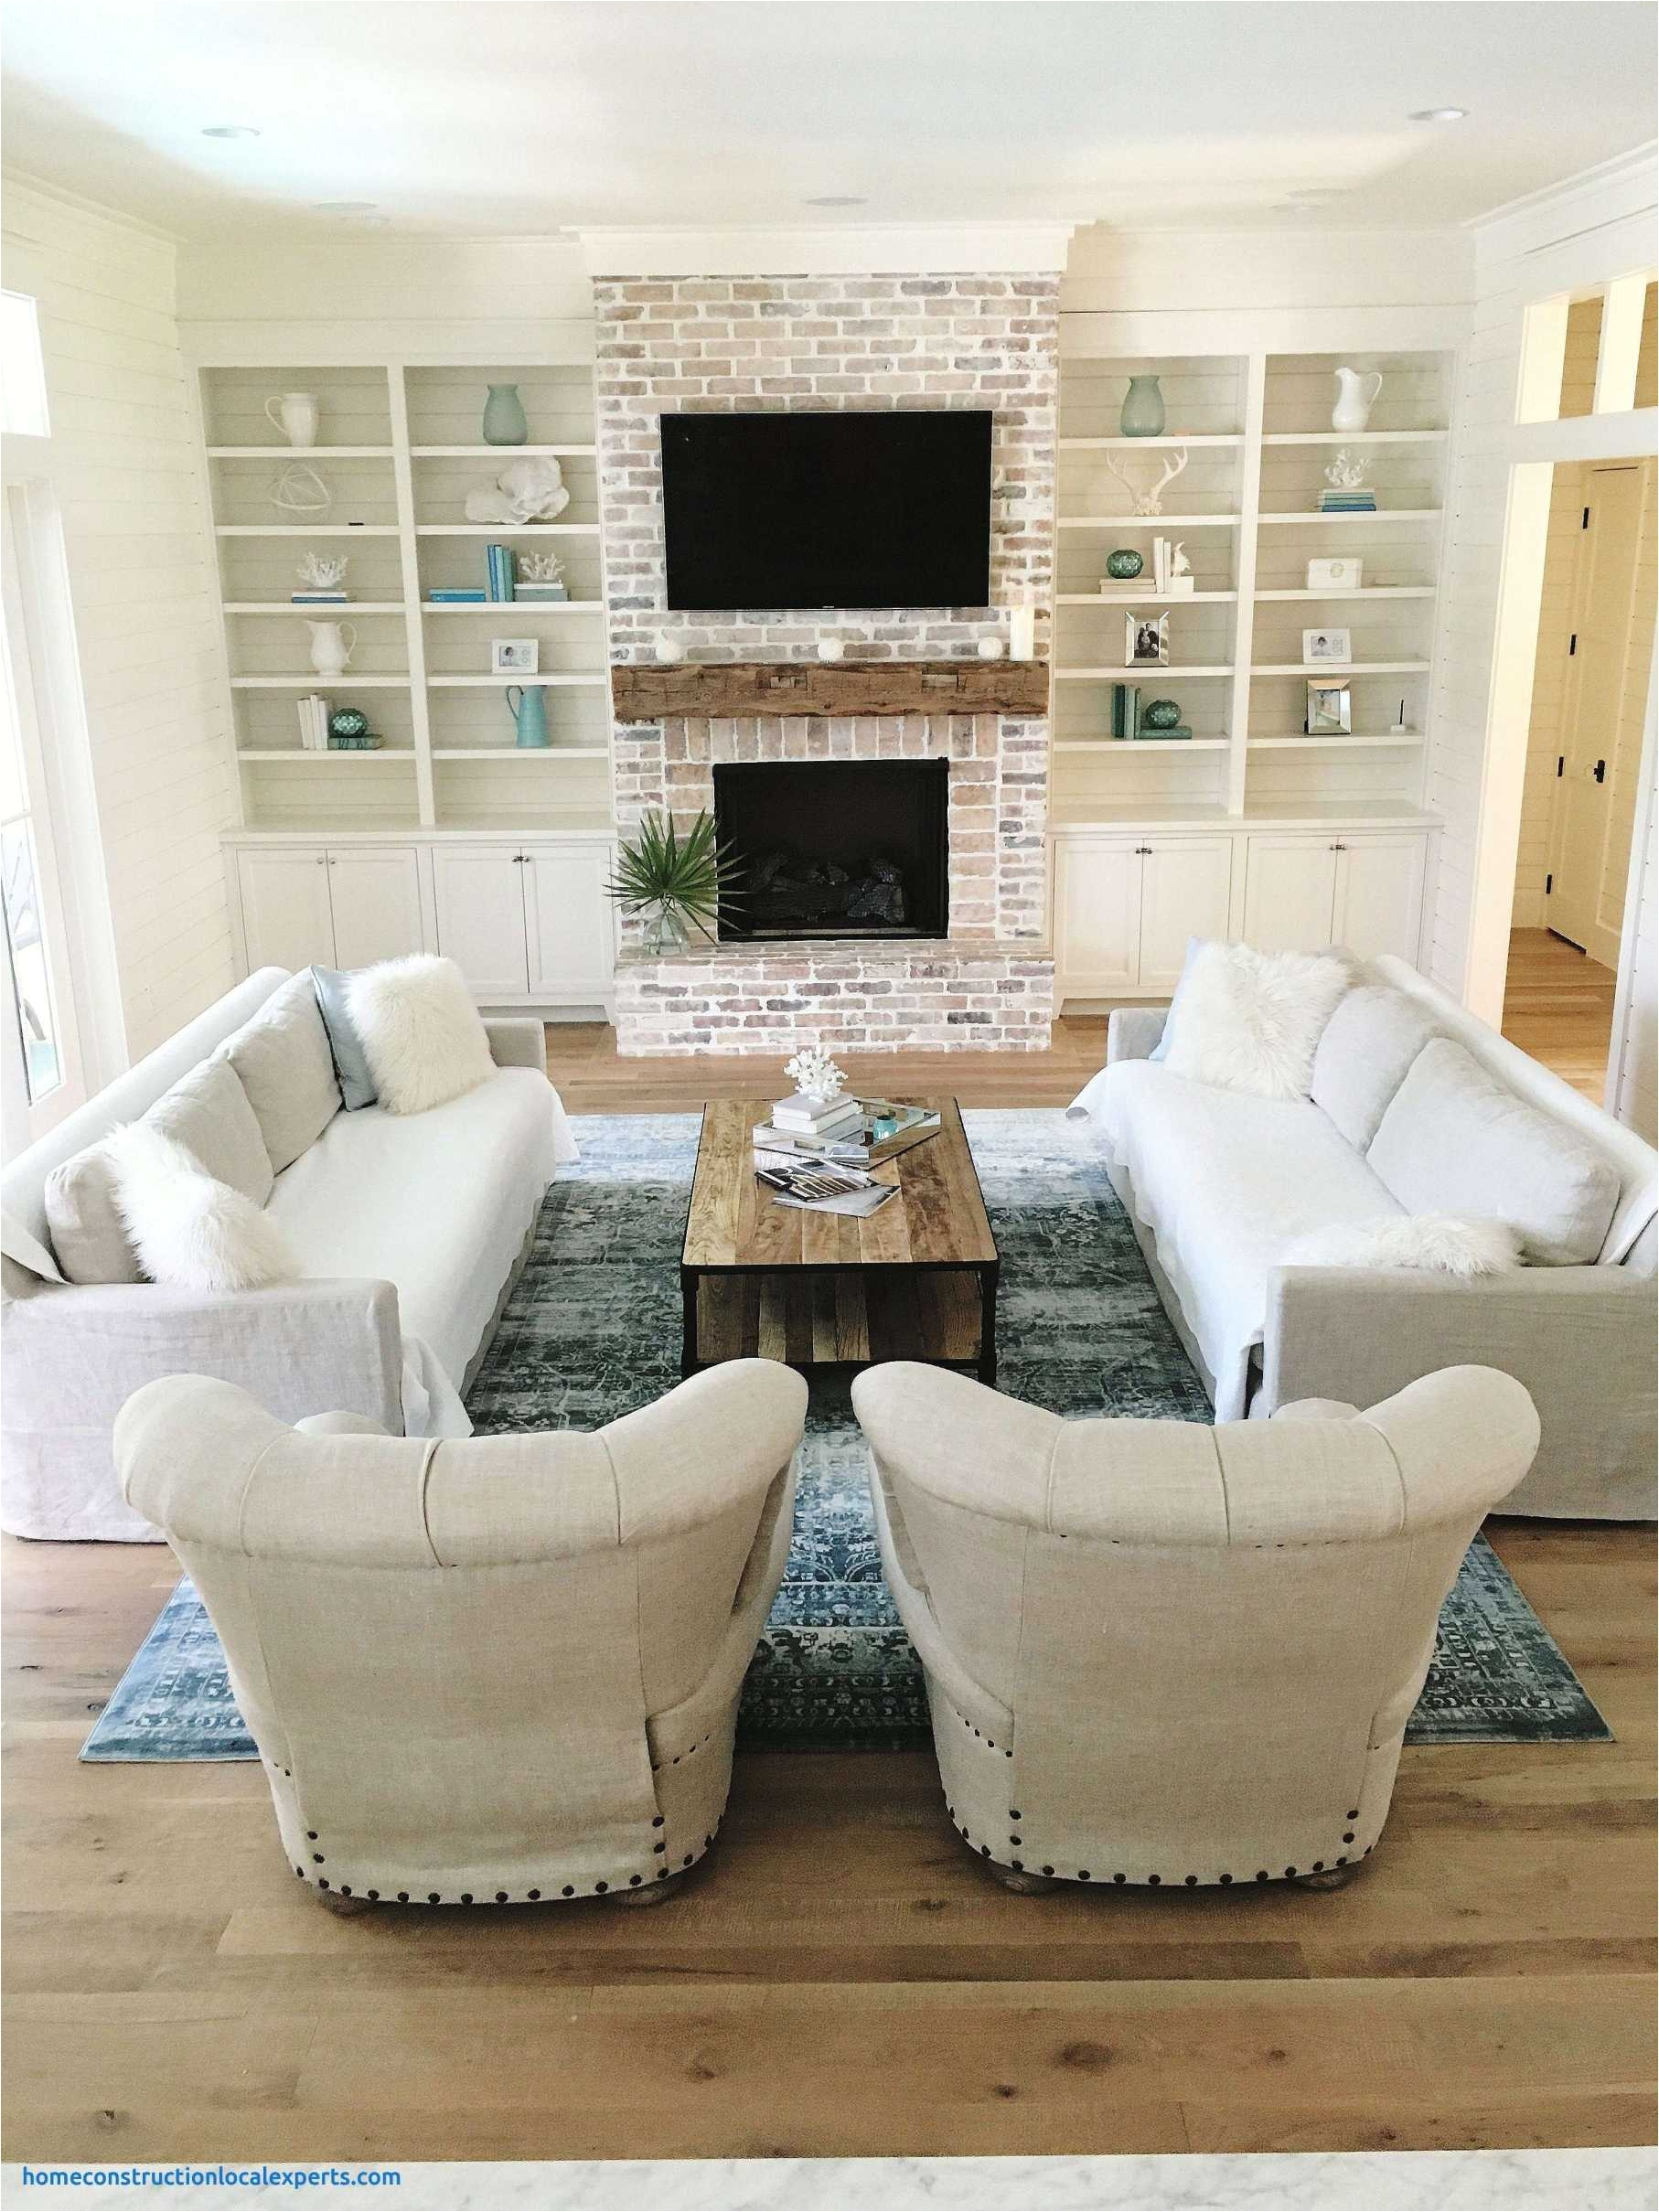 modern living room furniture new gunstige sofa macys furniture 0d design ideas stylish design furniture unique